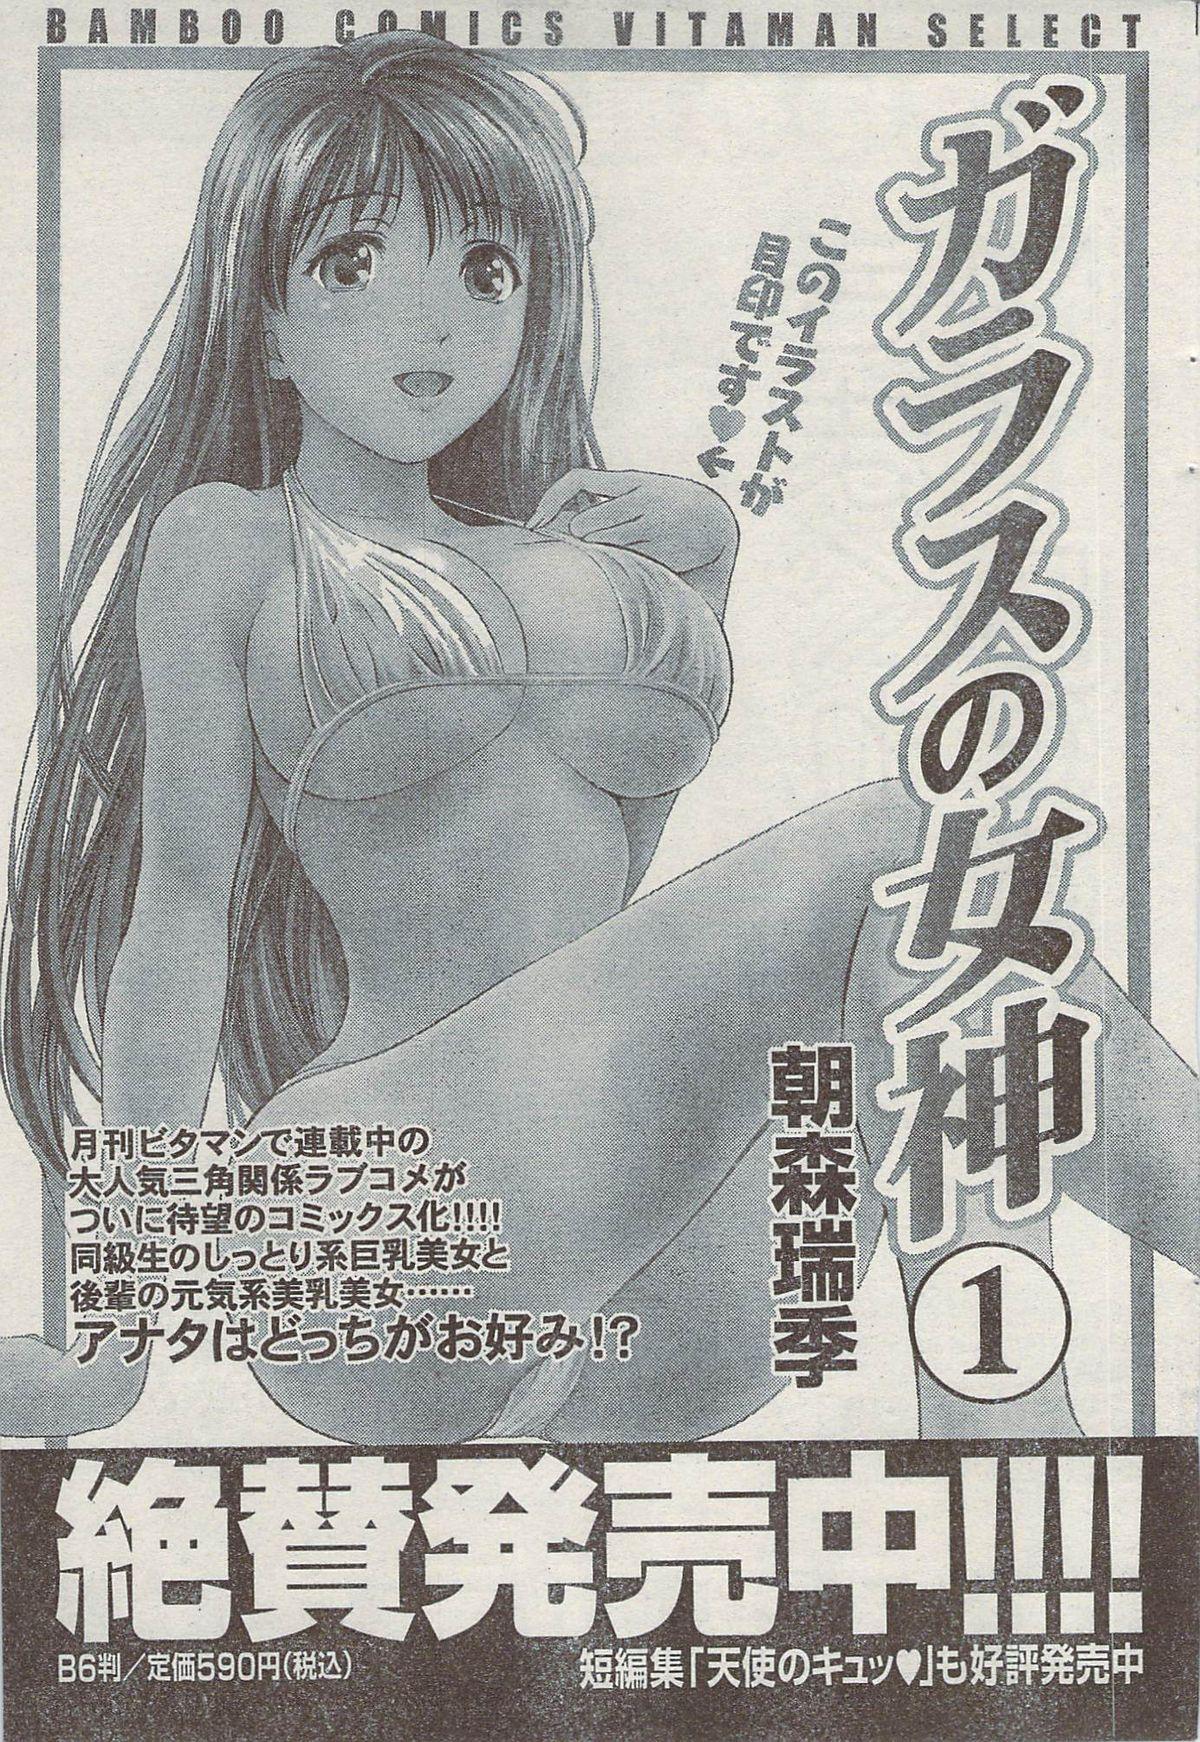 Monthly Vitaman 2007-08 48